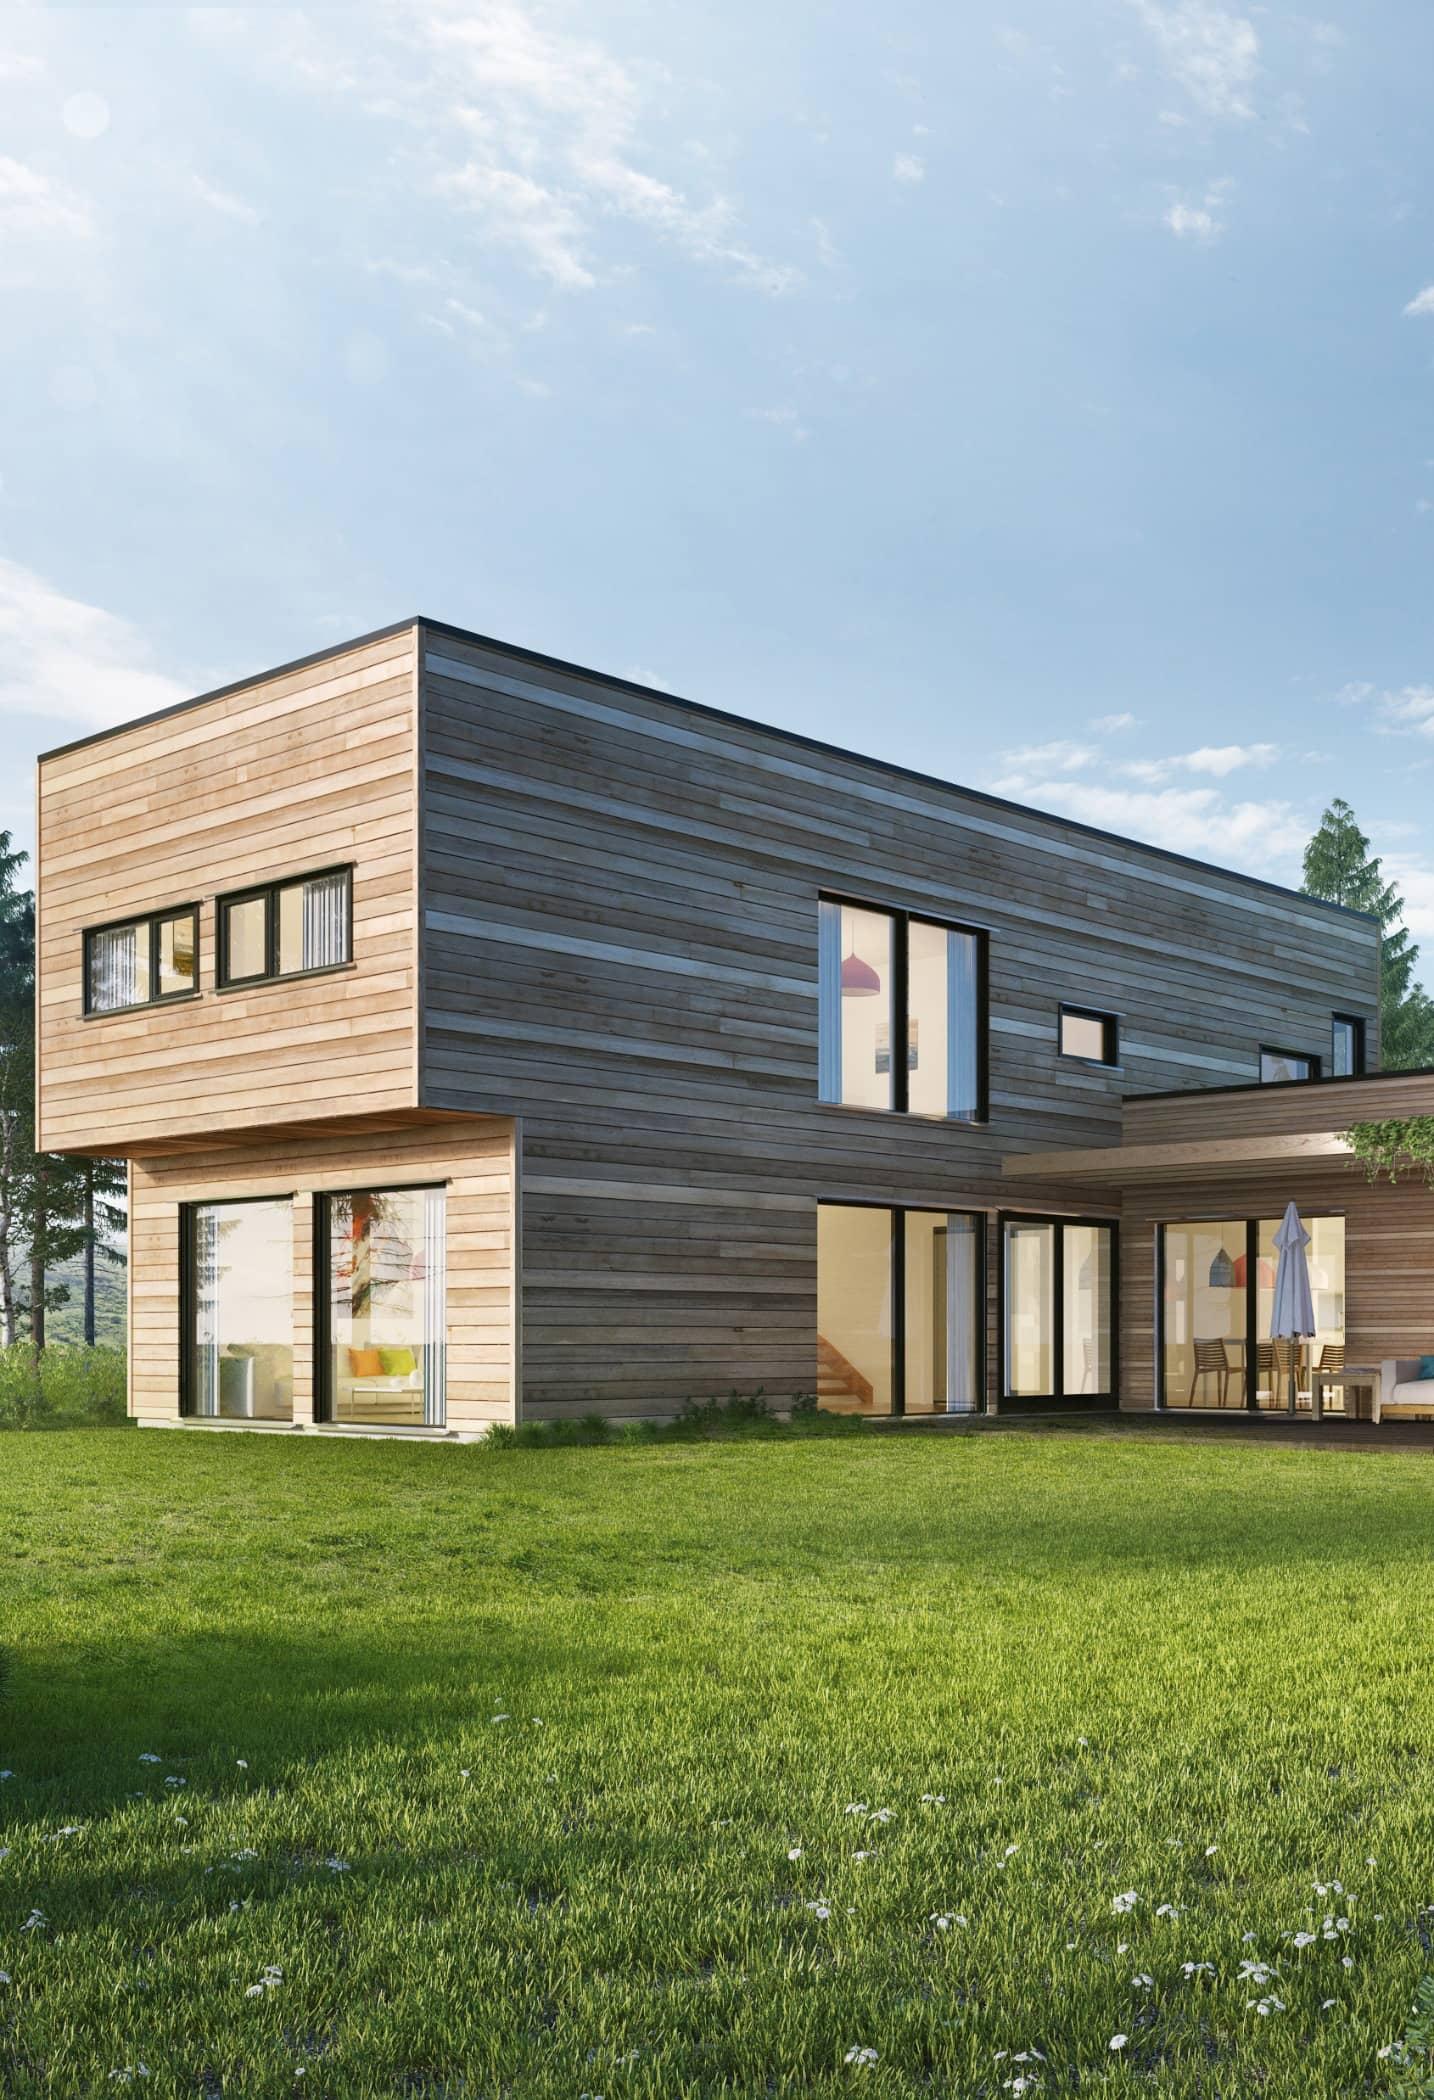 Real estate, Siding, Farmhouse, Facade, Building, Architecture, Home, Property, House